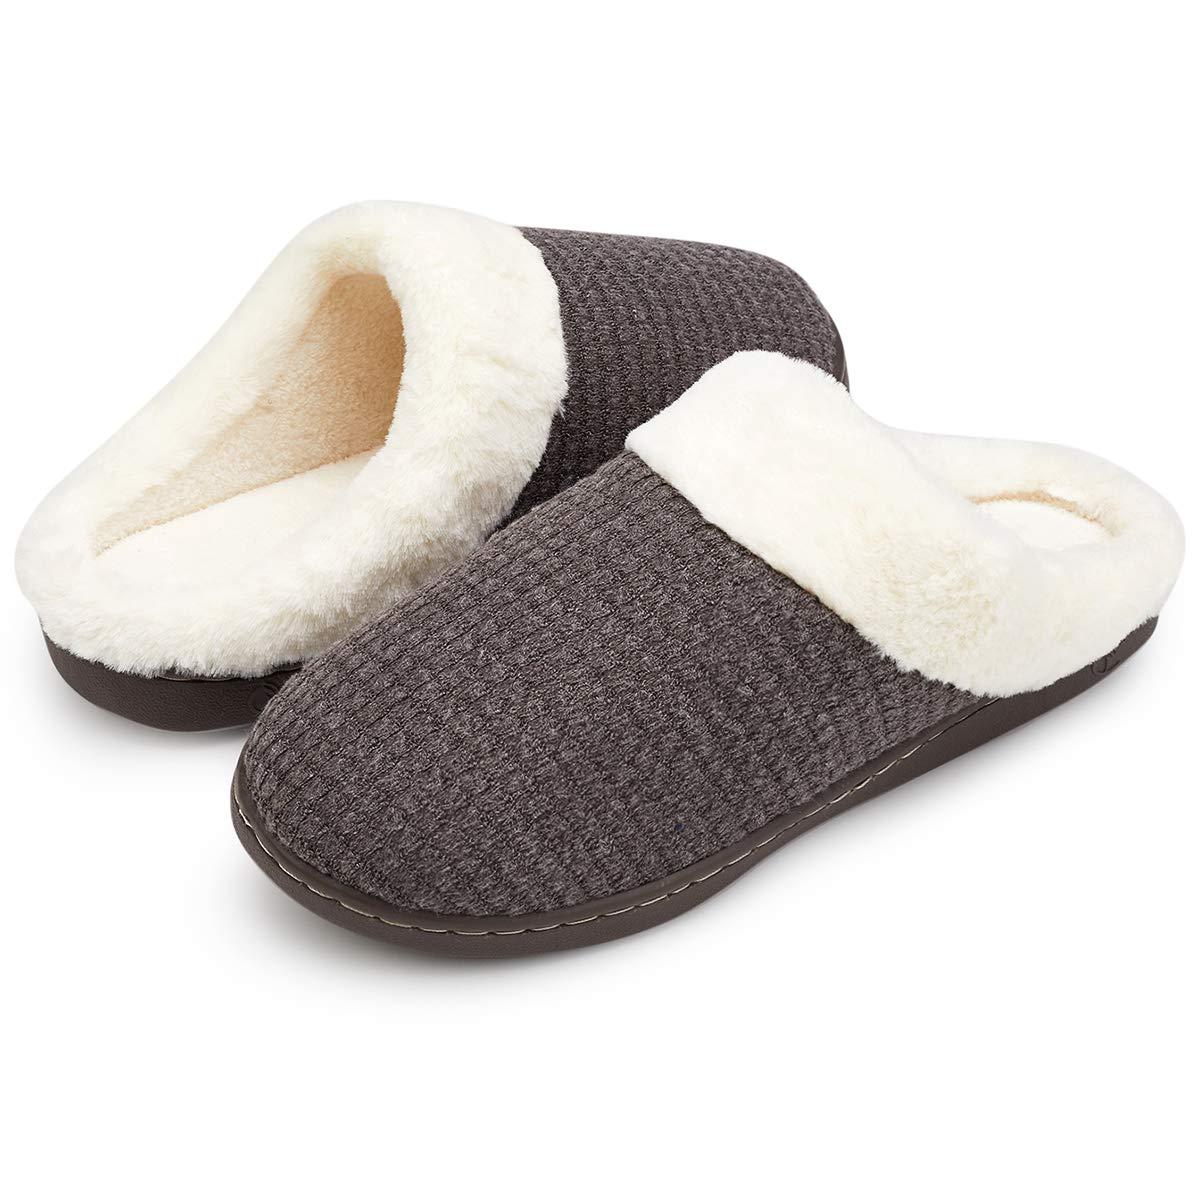 VIFUUR Women's Indoor Slippers House Comfort Memory Foam Plush Anti-Slip Slipper Outdoor Shoes Khaki Gray-42/43 by VIFUUR (Image #1)